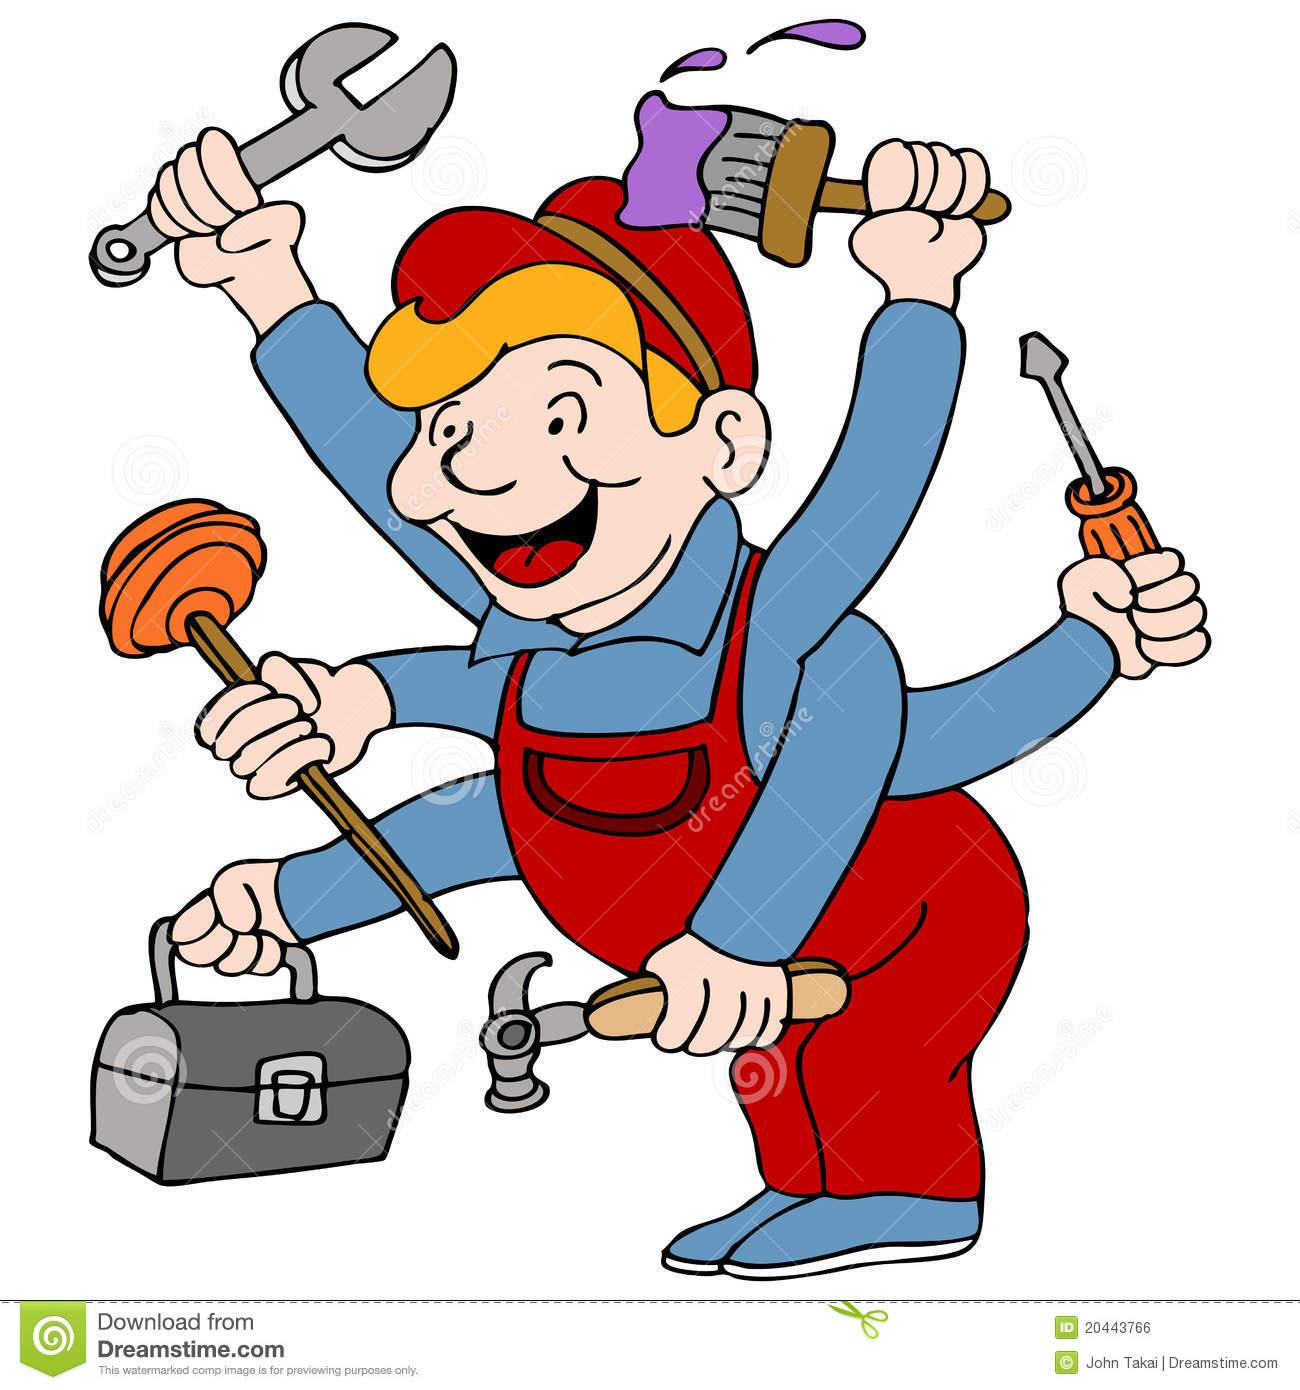 Handyman Royalty Free Stock Image-Handyman Royalty Free Stock Image-7